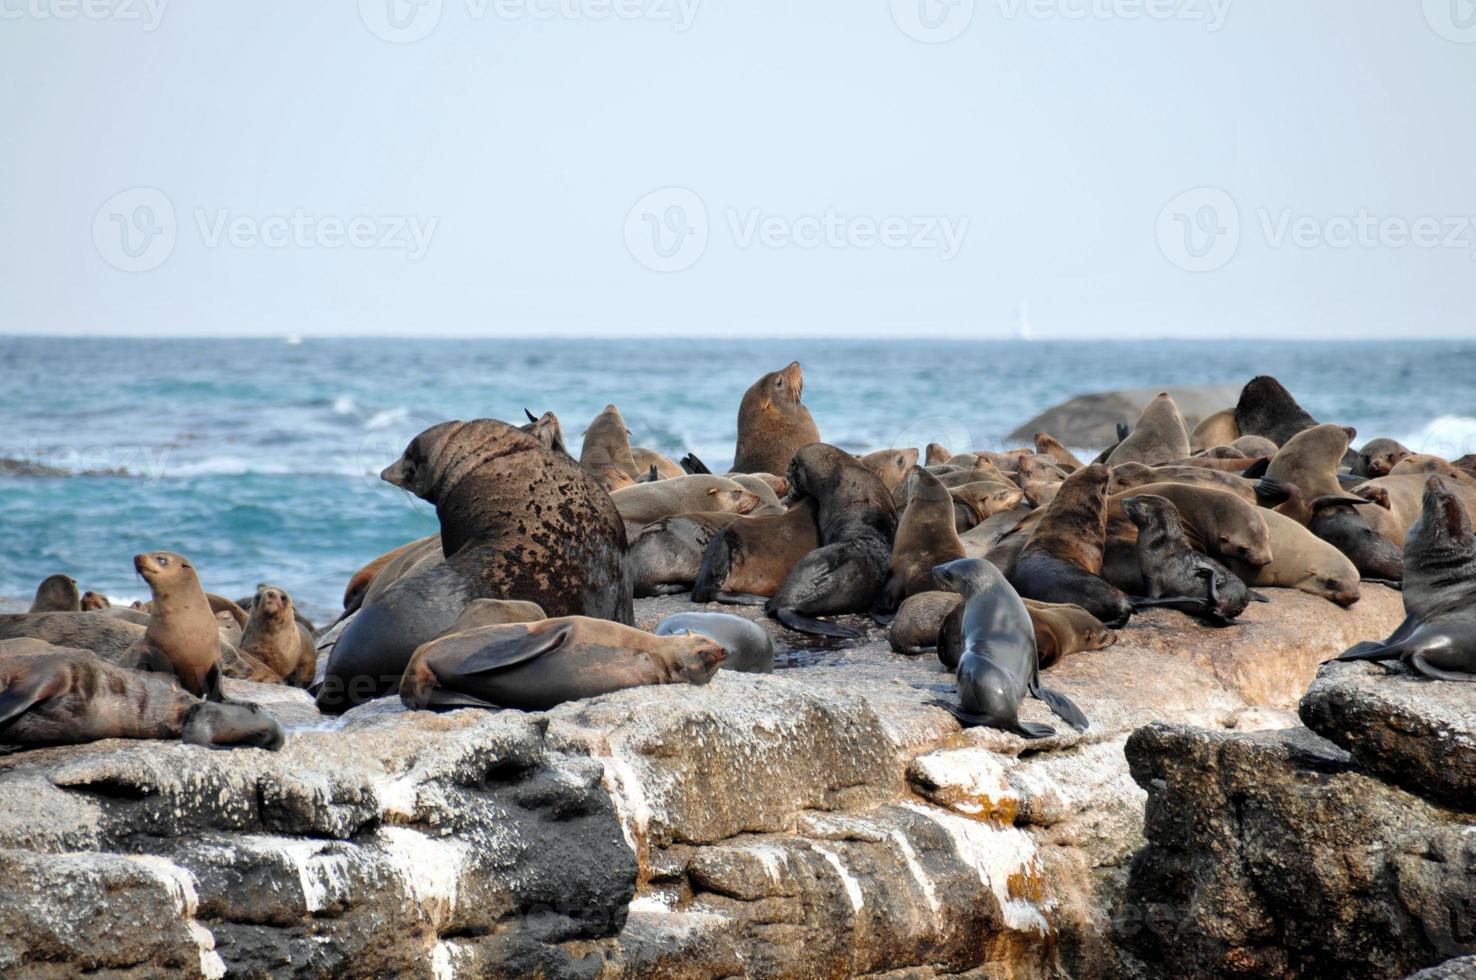 Cape Fur seals, Seal Island in False Bay photo